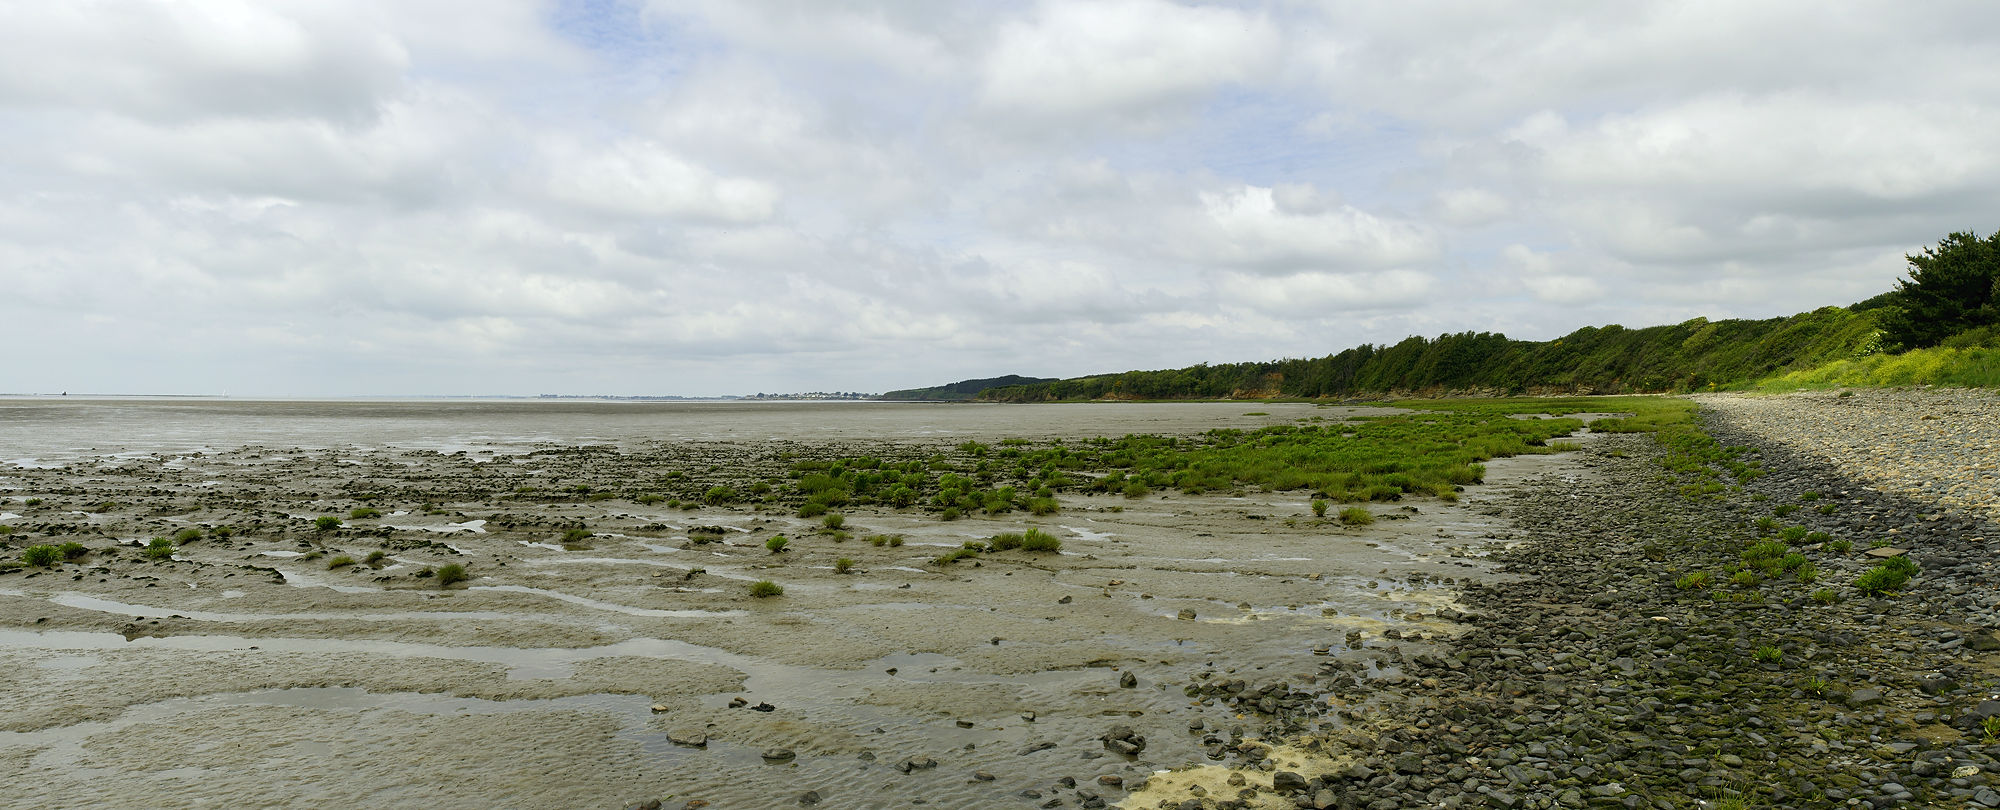 * Strandspaziergang am Auslauf der Vilaine ~ Ebbe *